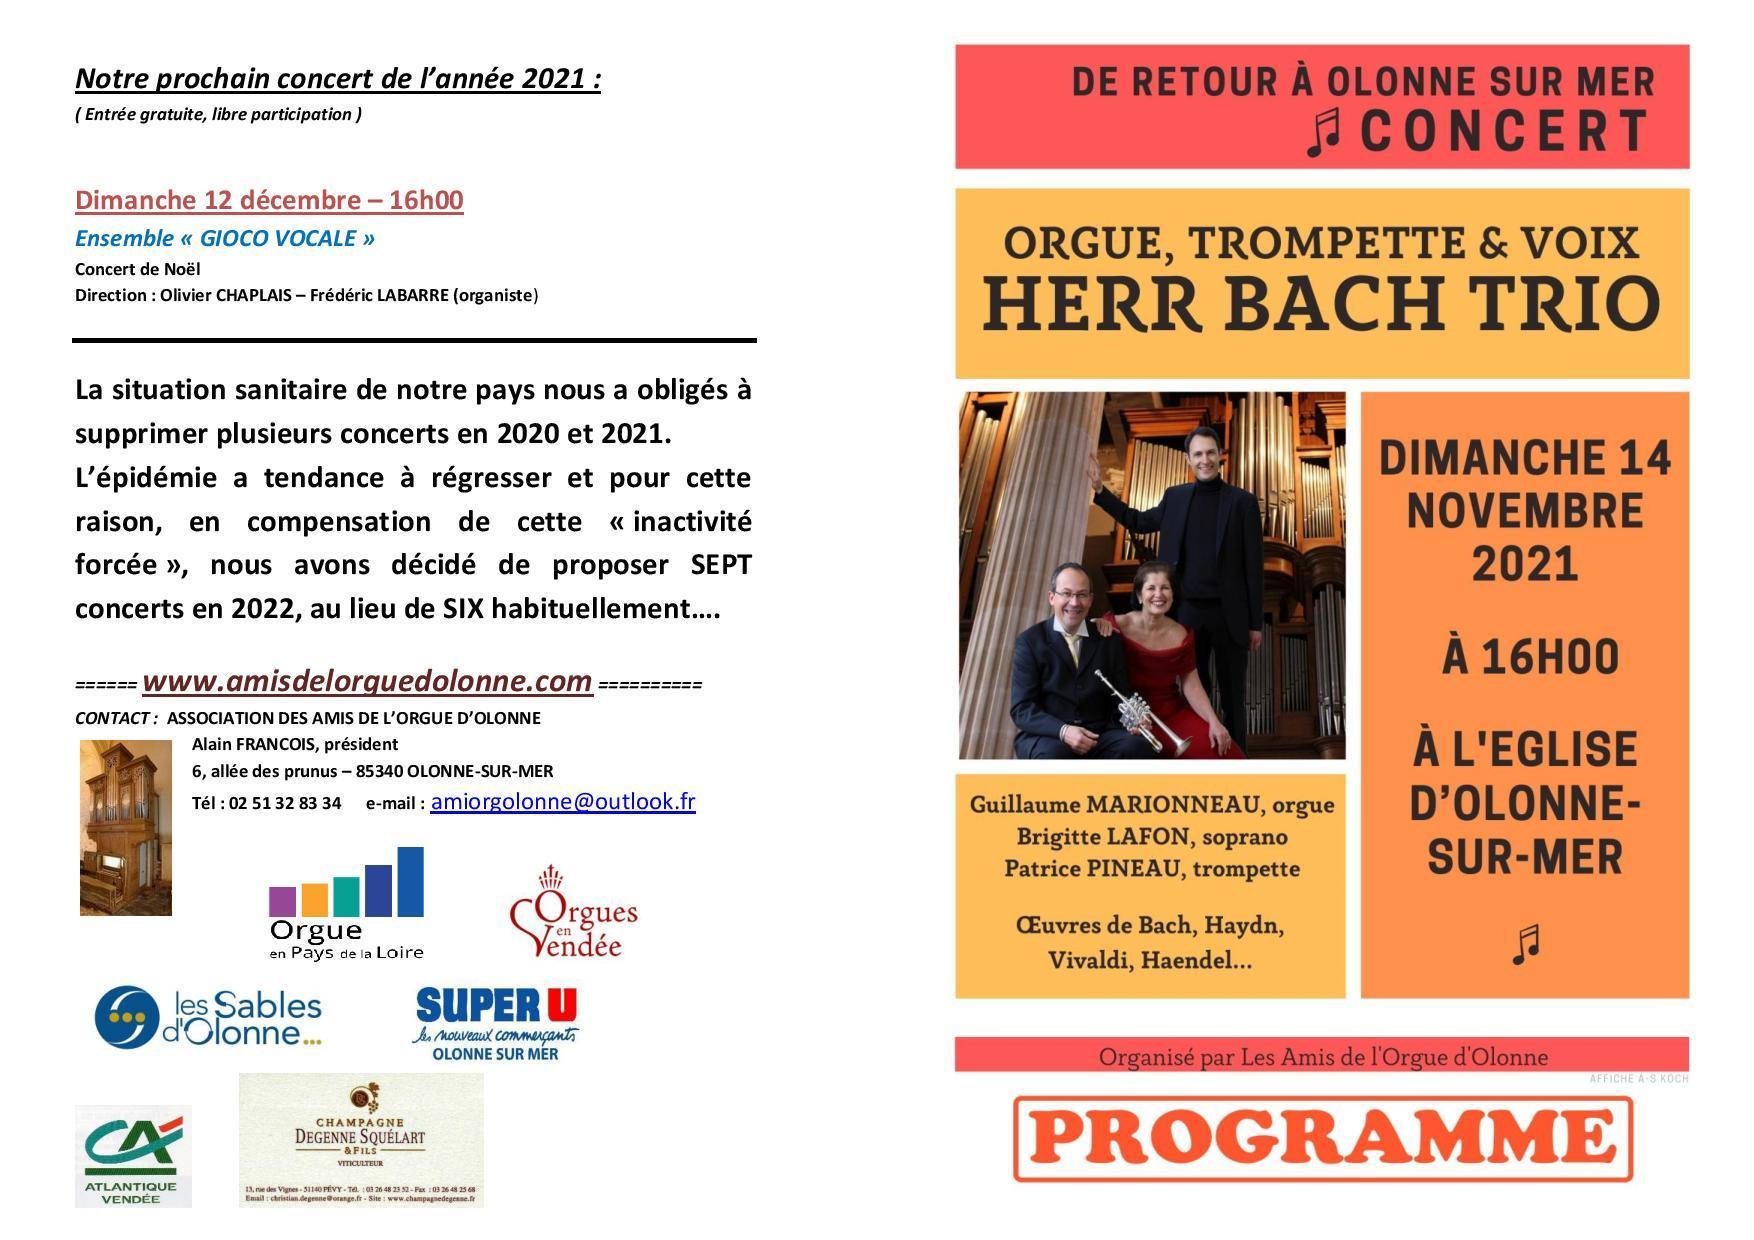 2021 11 14 programme herr bach trio page 1